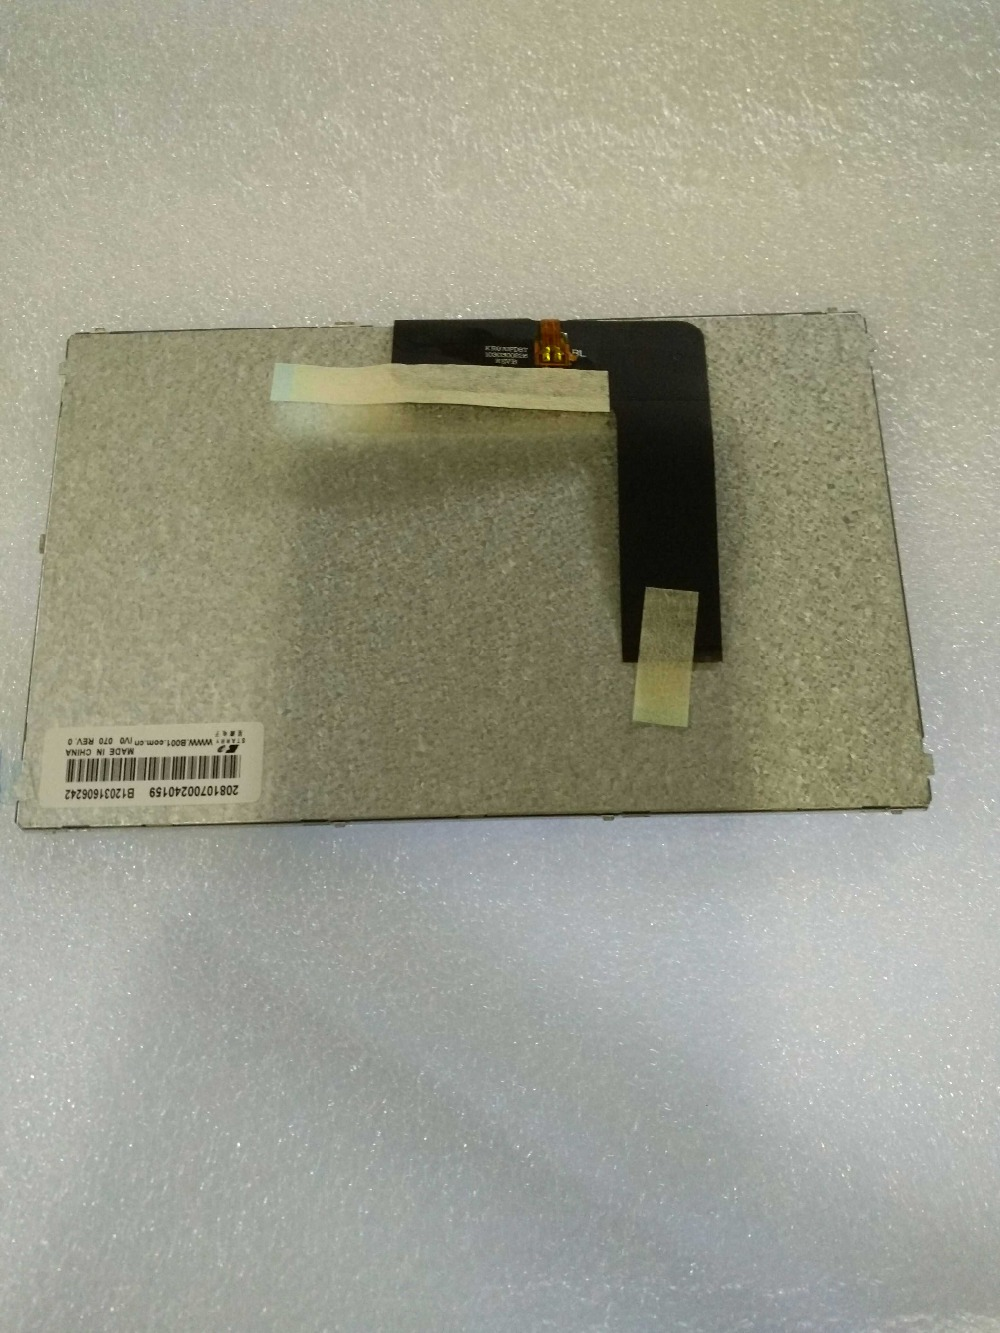 KR070PD8T 103000226 REV B LCD screen display<br>